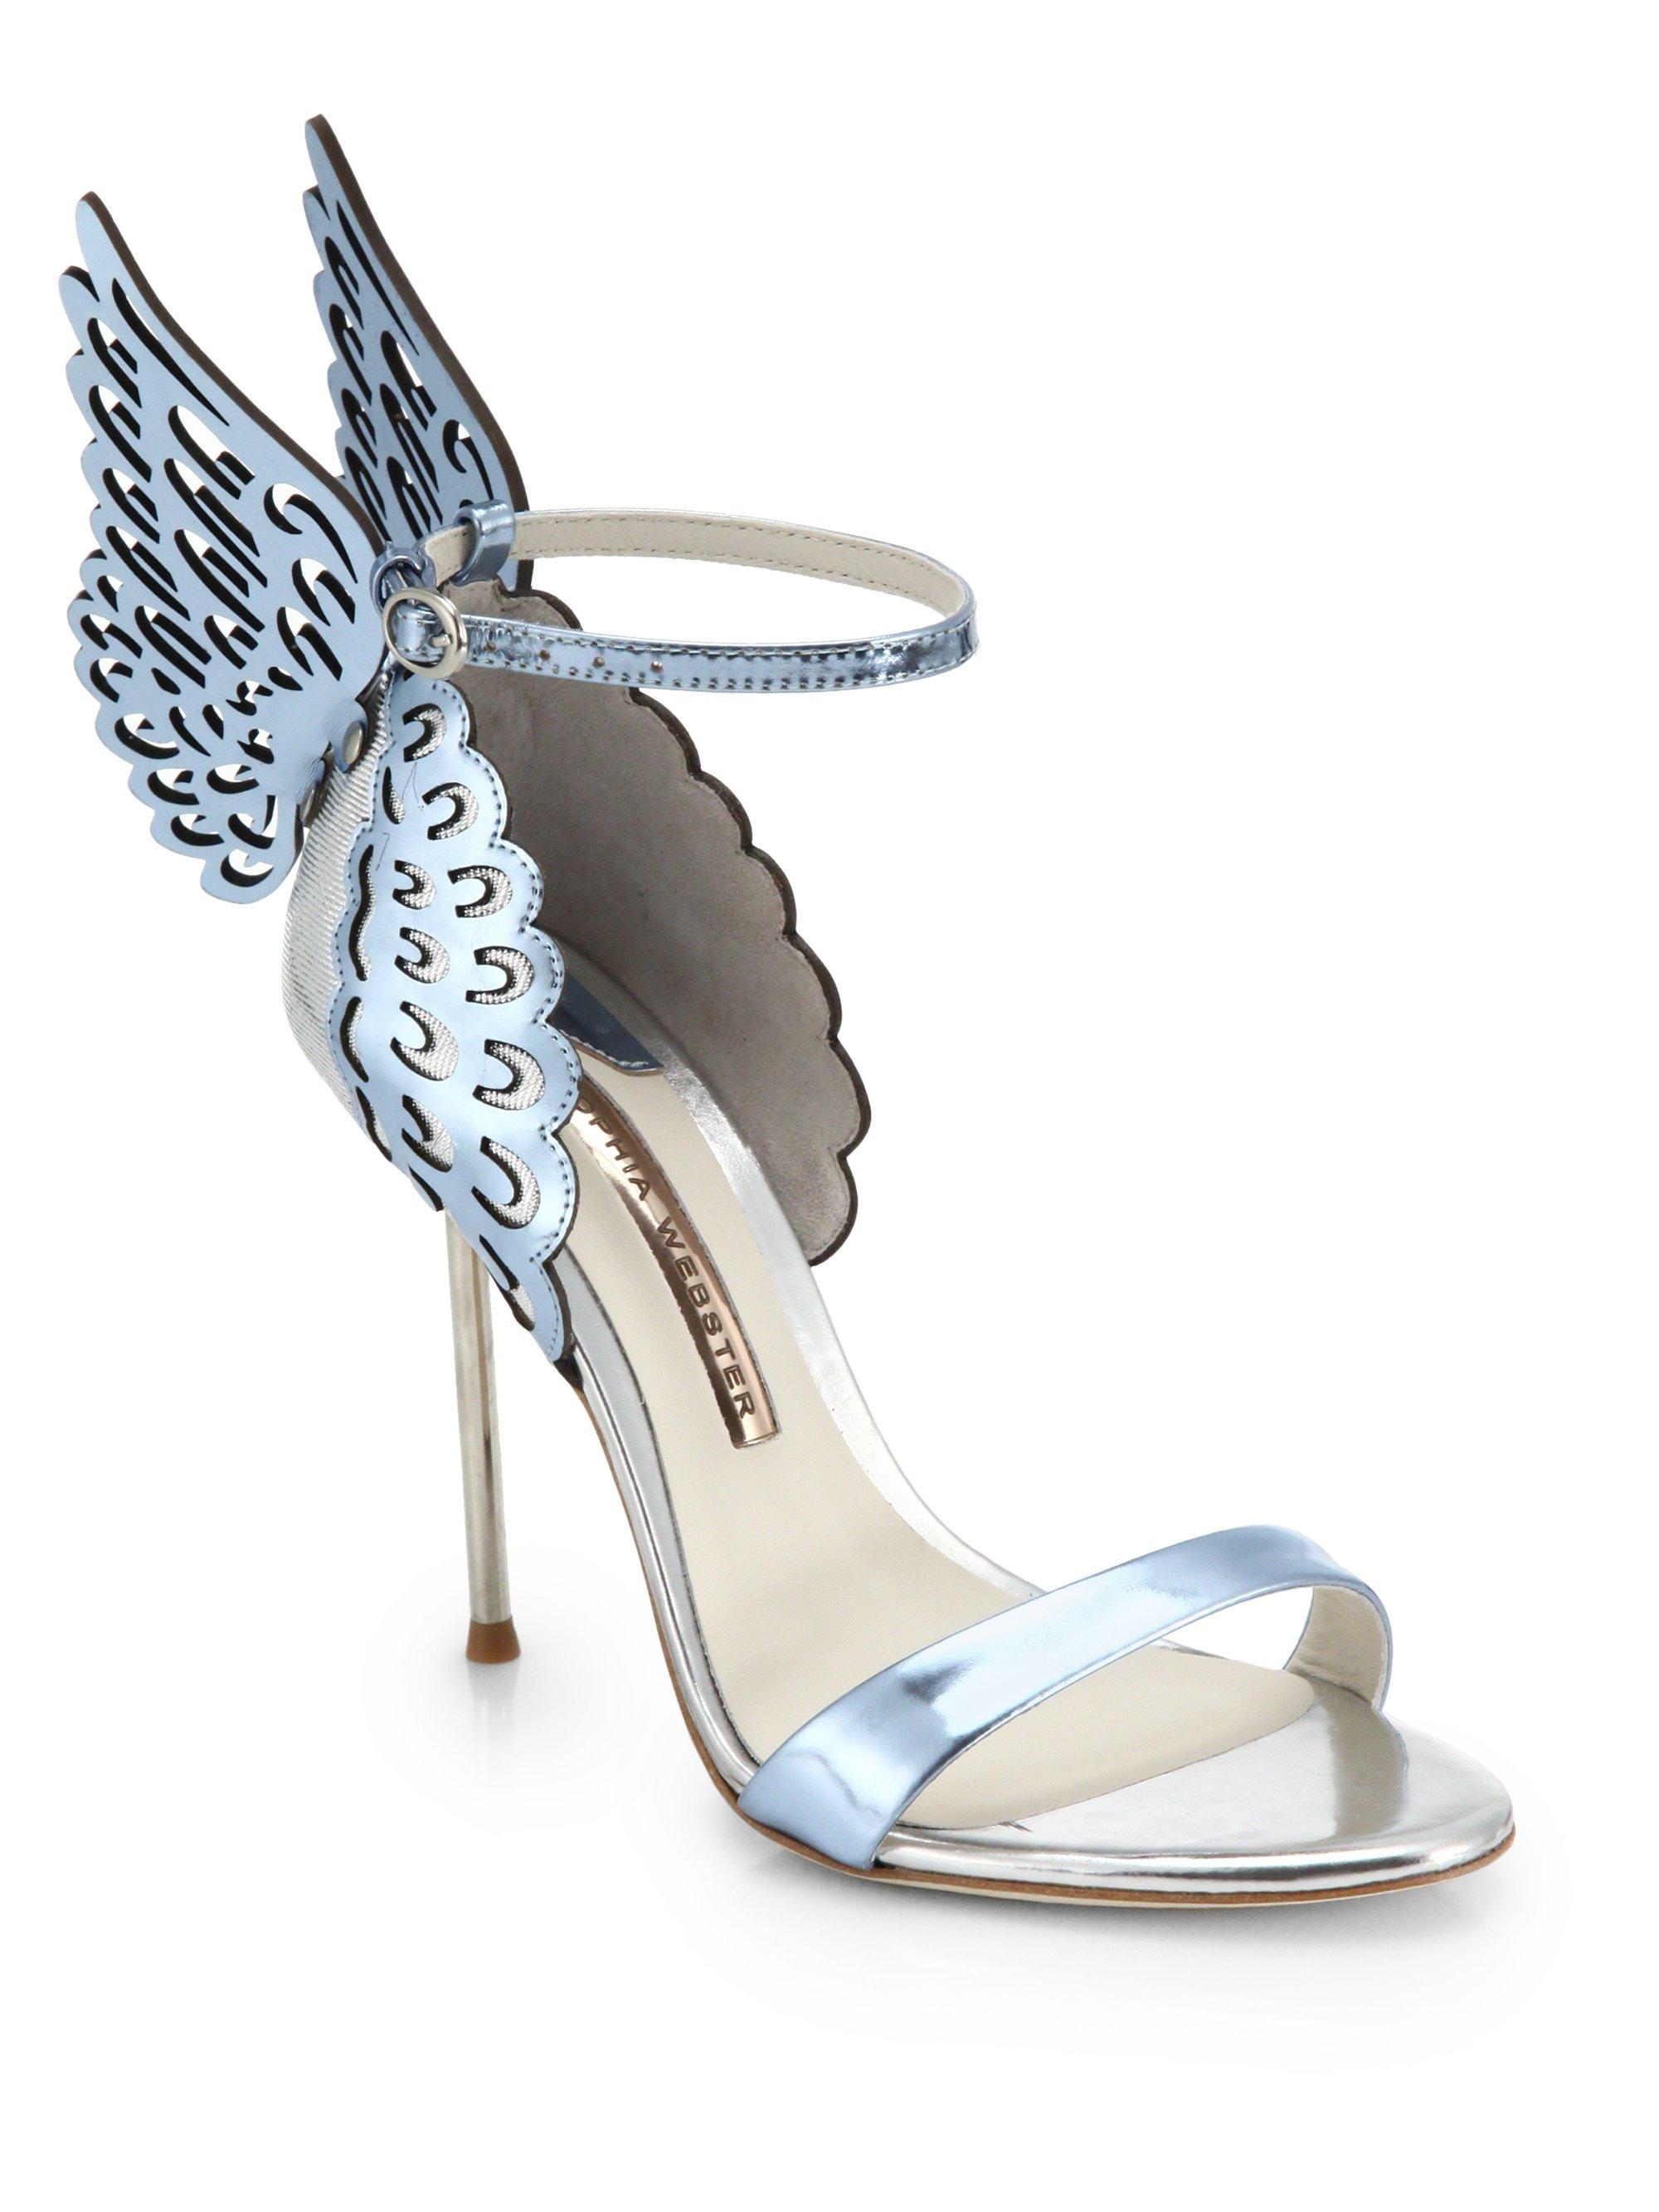 d7d7f4bca93259 Lyst - Sophia Webster Evangeline Winged Leather Sandals in Metallic